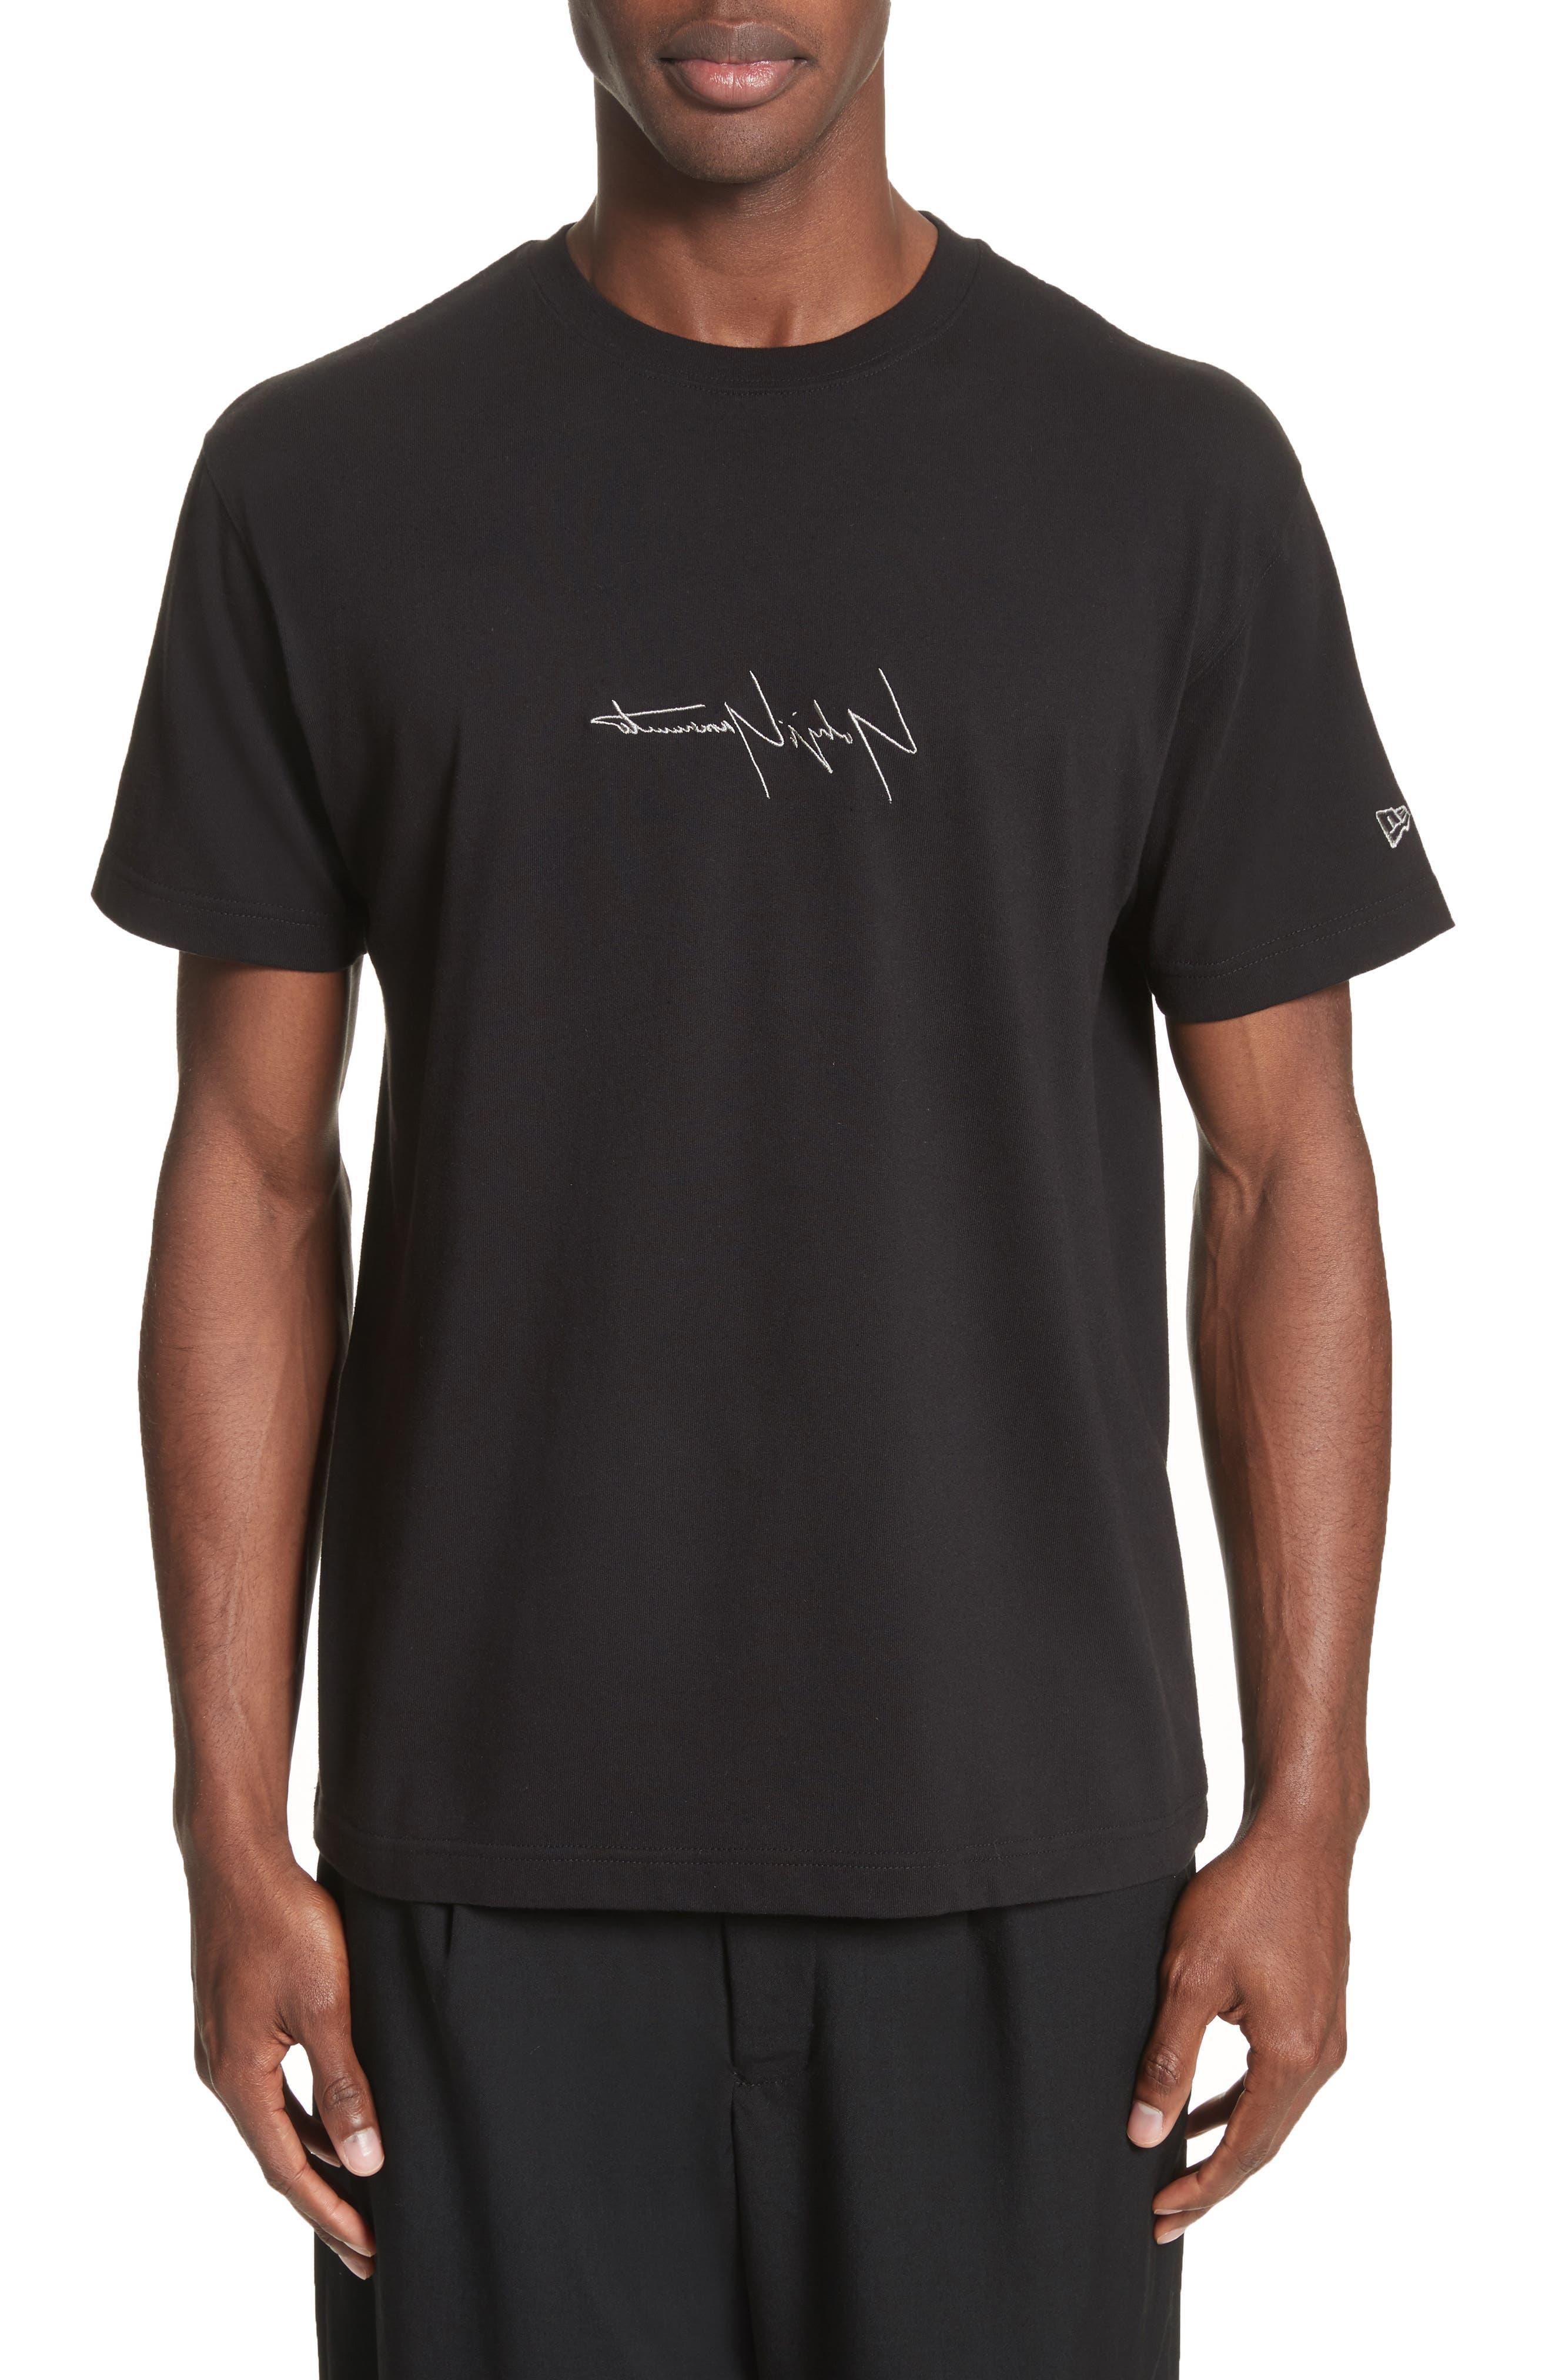 Main Image - Yohji Yamamoto x New Era Embroidered Script T-Shirt